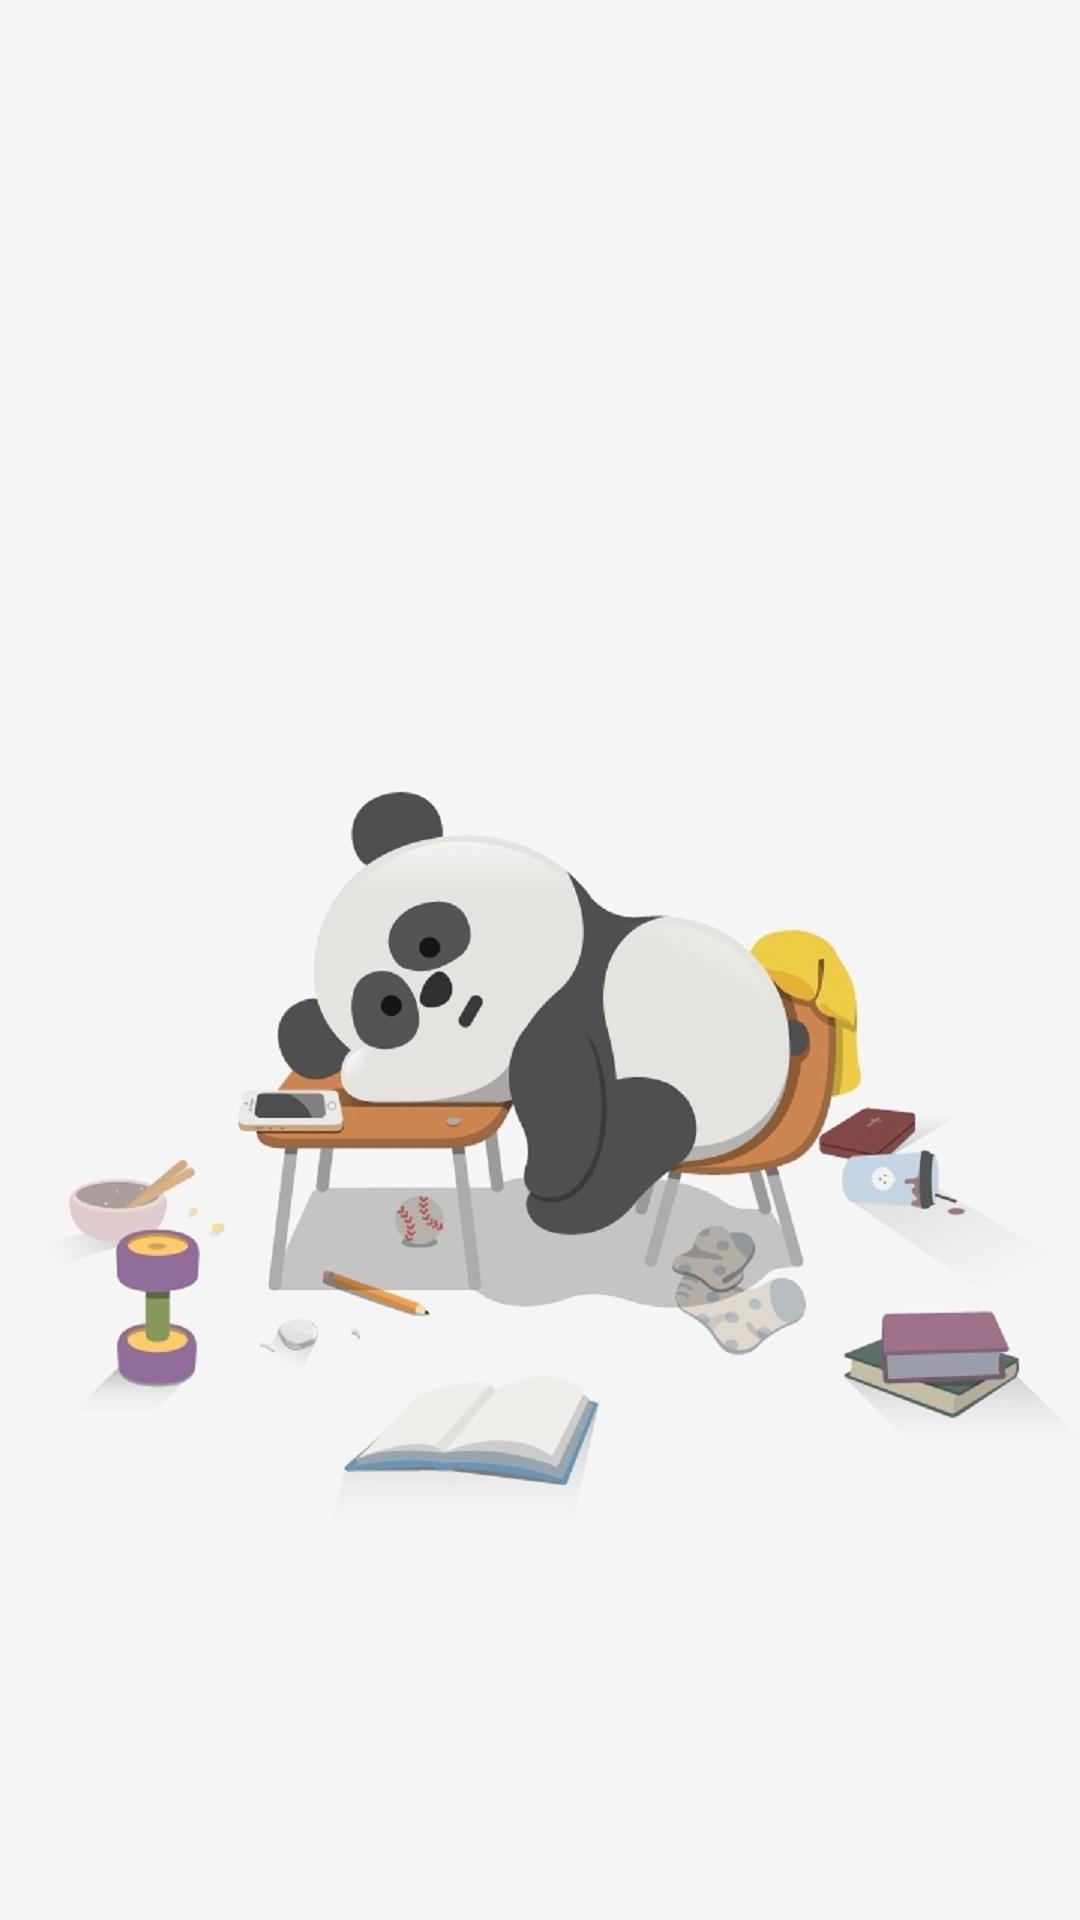 Cute-Sleepy-Panda-Cute-Animal-iPhone-Tap-to-